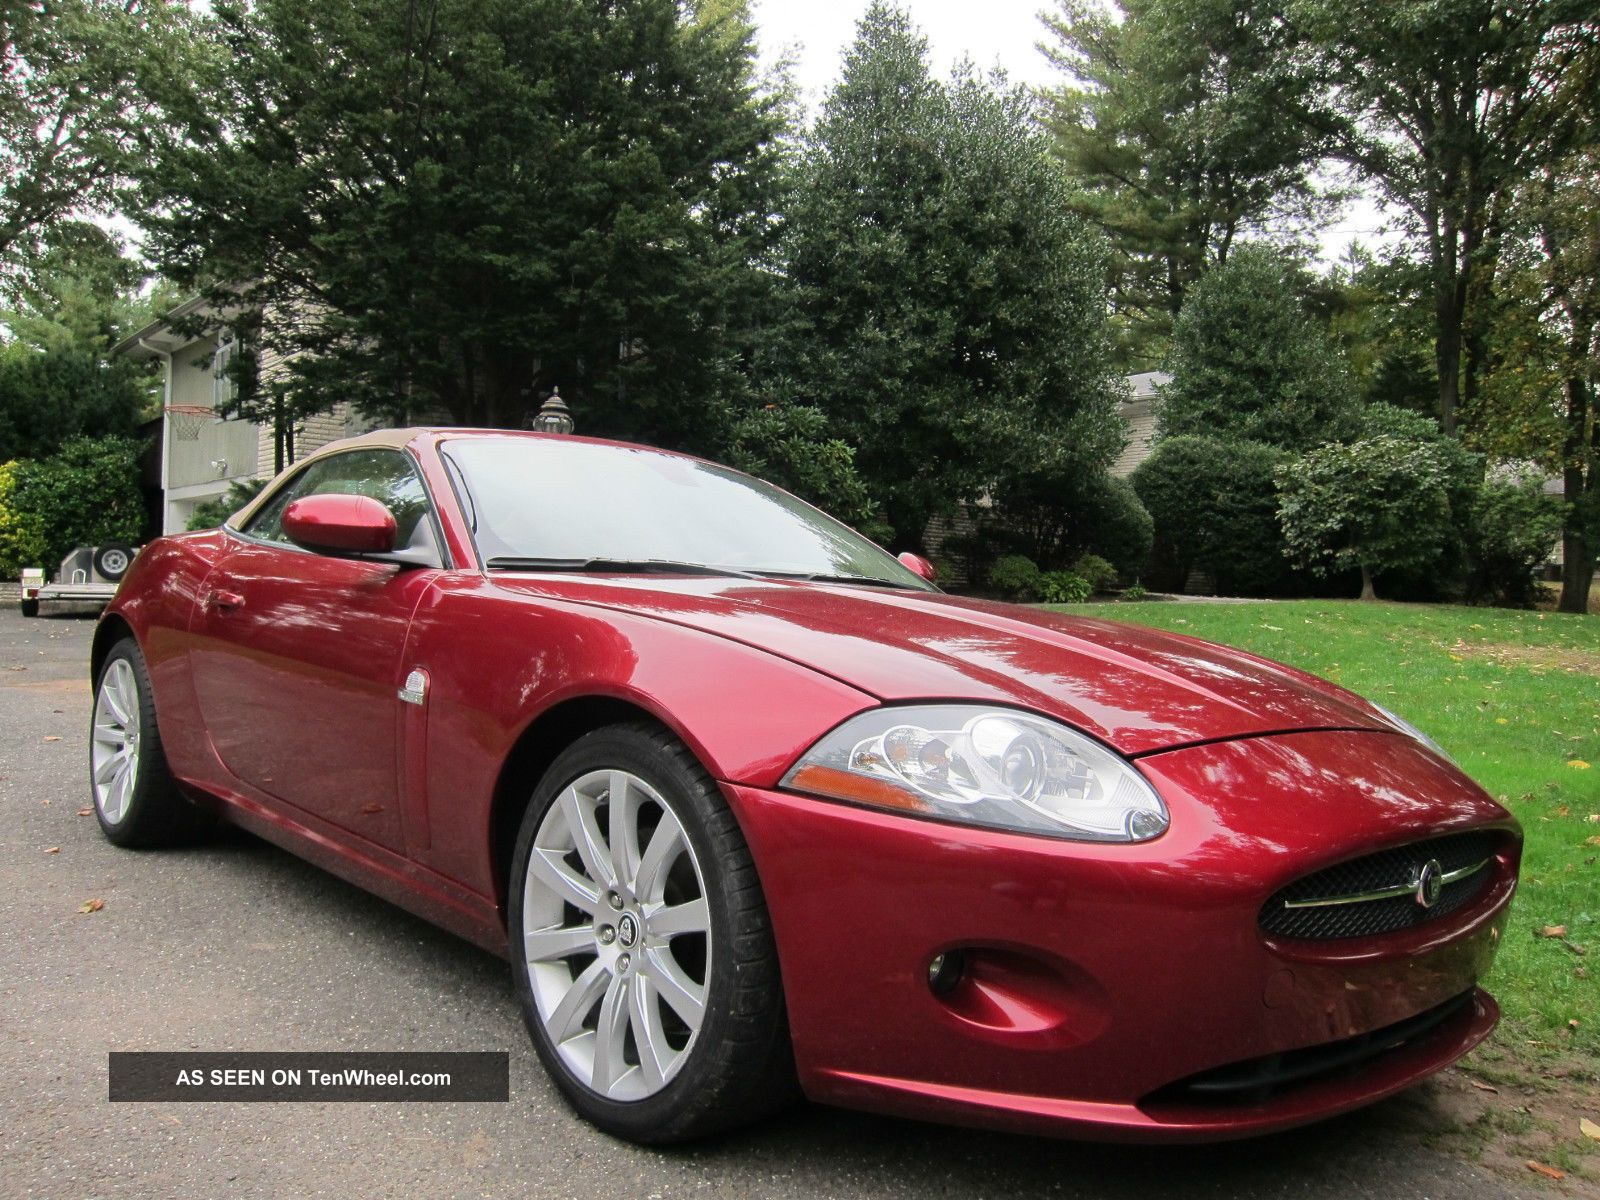 convertible xk sale jaguar exterior reviews features for photos touring price